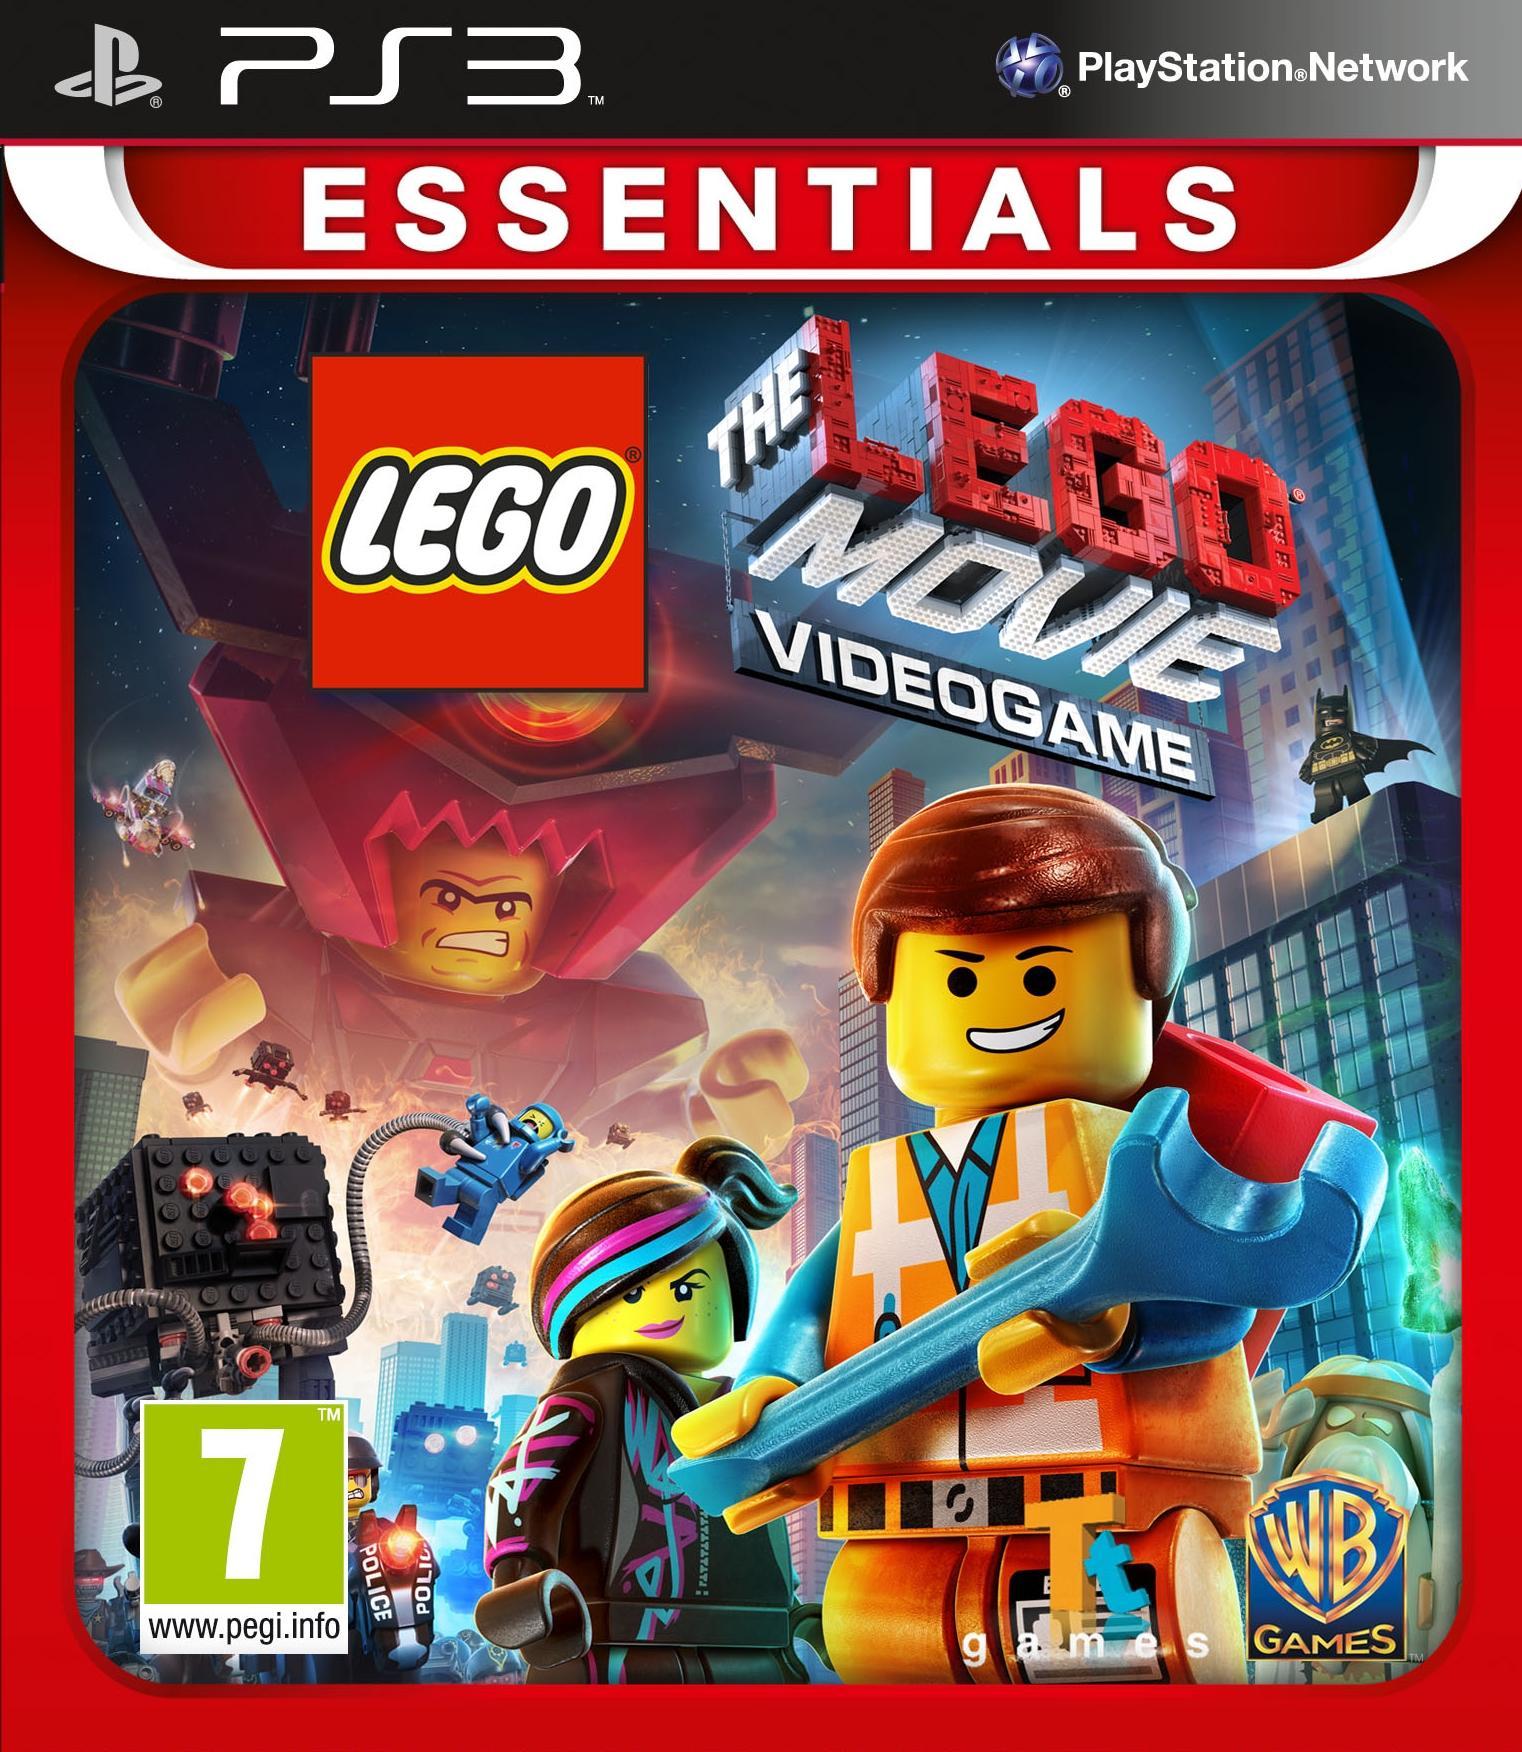 Mindscape LEGO Movie (Essentials) PS3 (1000569308) thumbnail